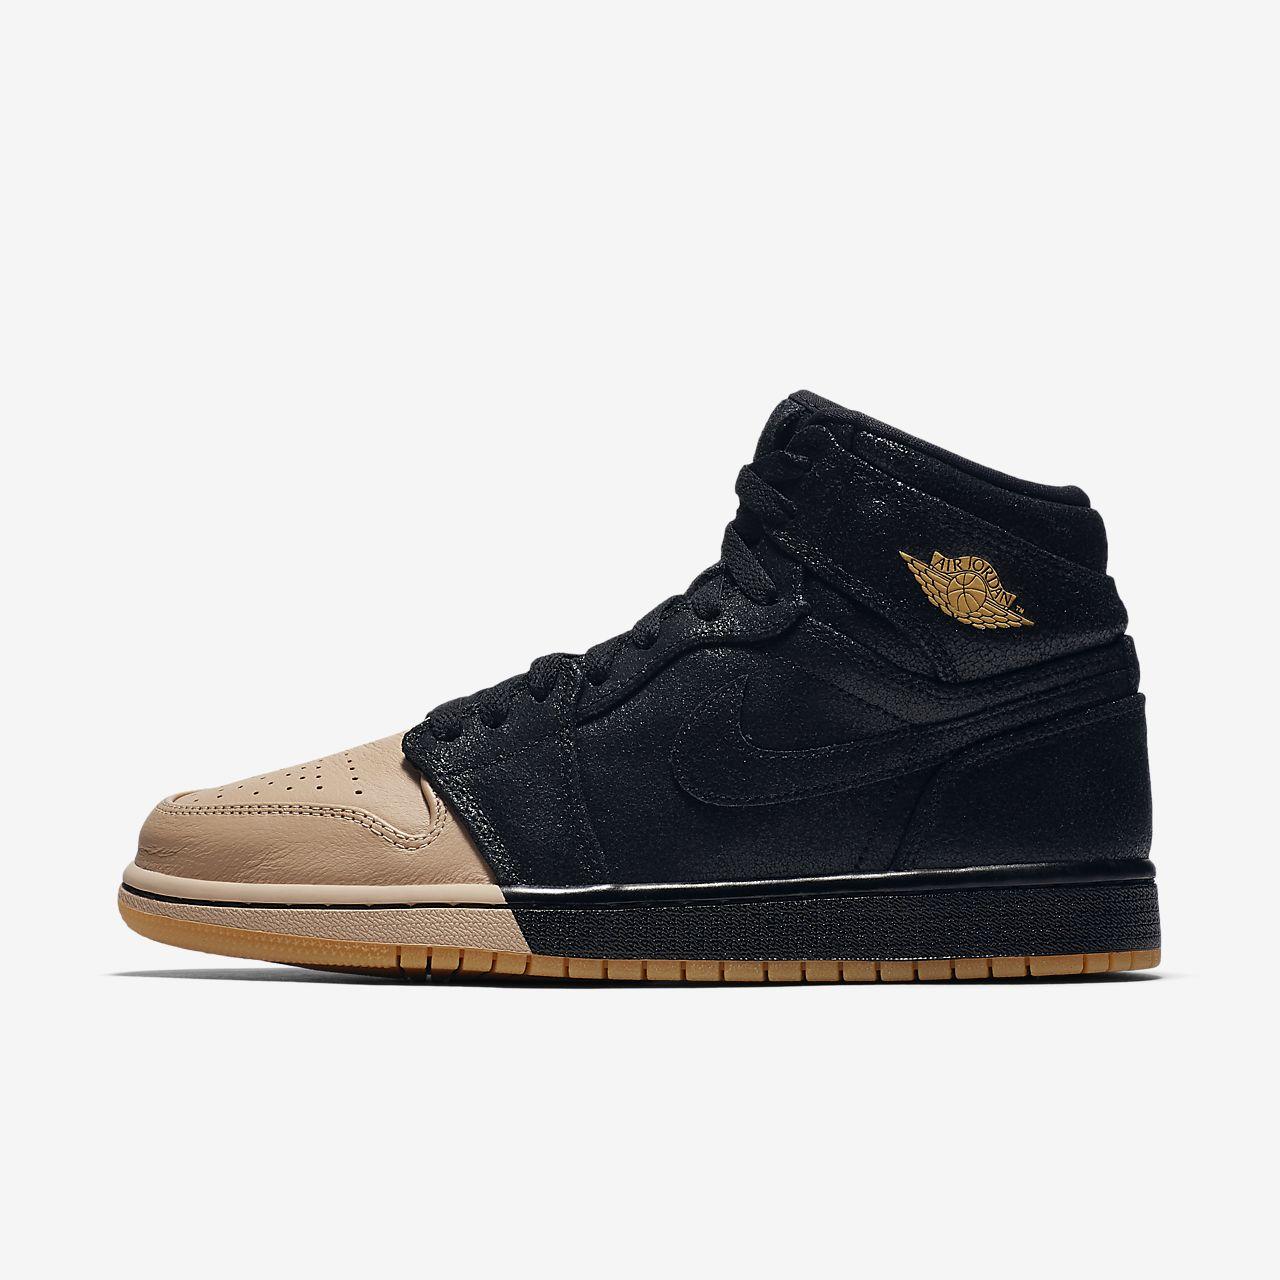 503a5cb31 Nike Air Jordan 1 Retro High Premium Zapatillas - Mujer. Nike.com ES